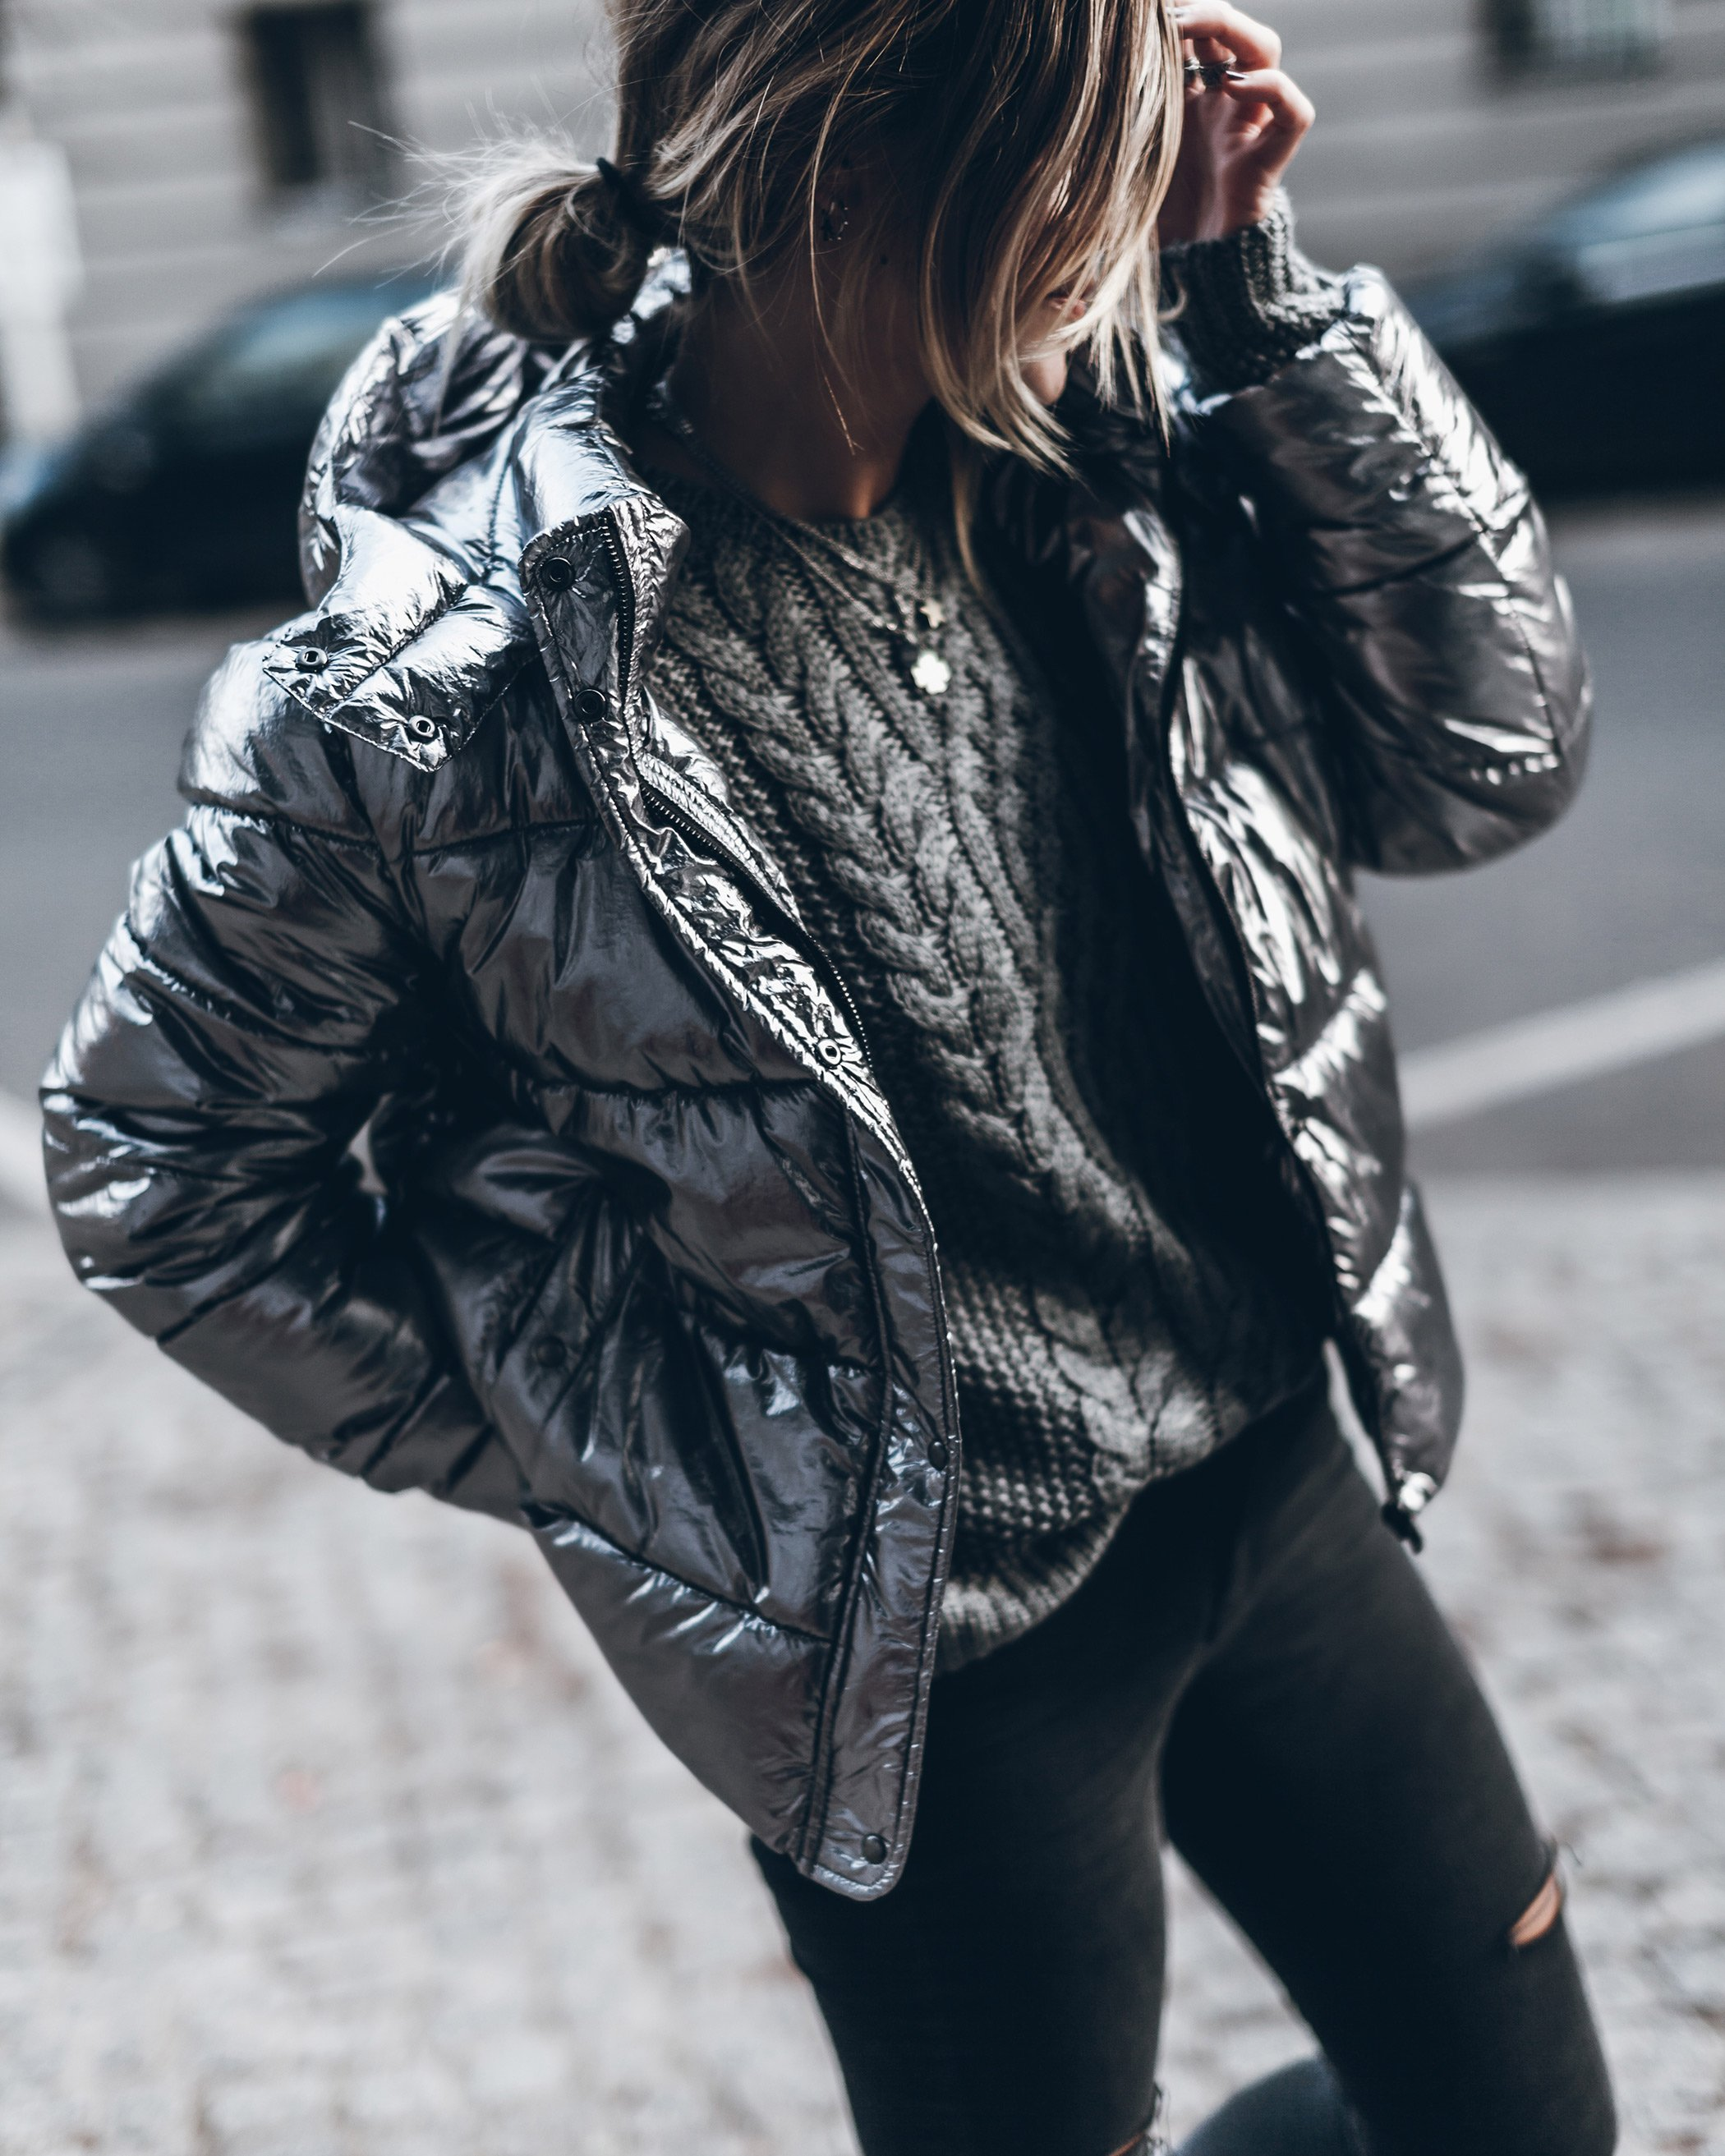 mikuta-silver-jacket-3